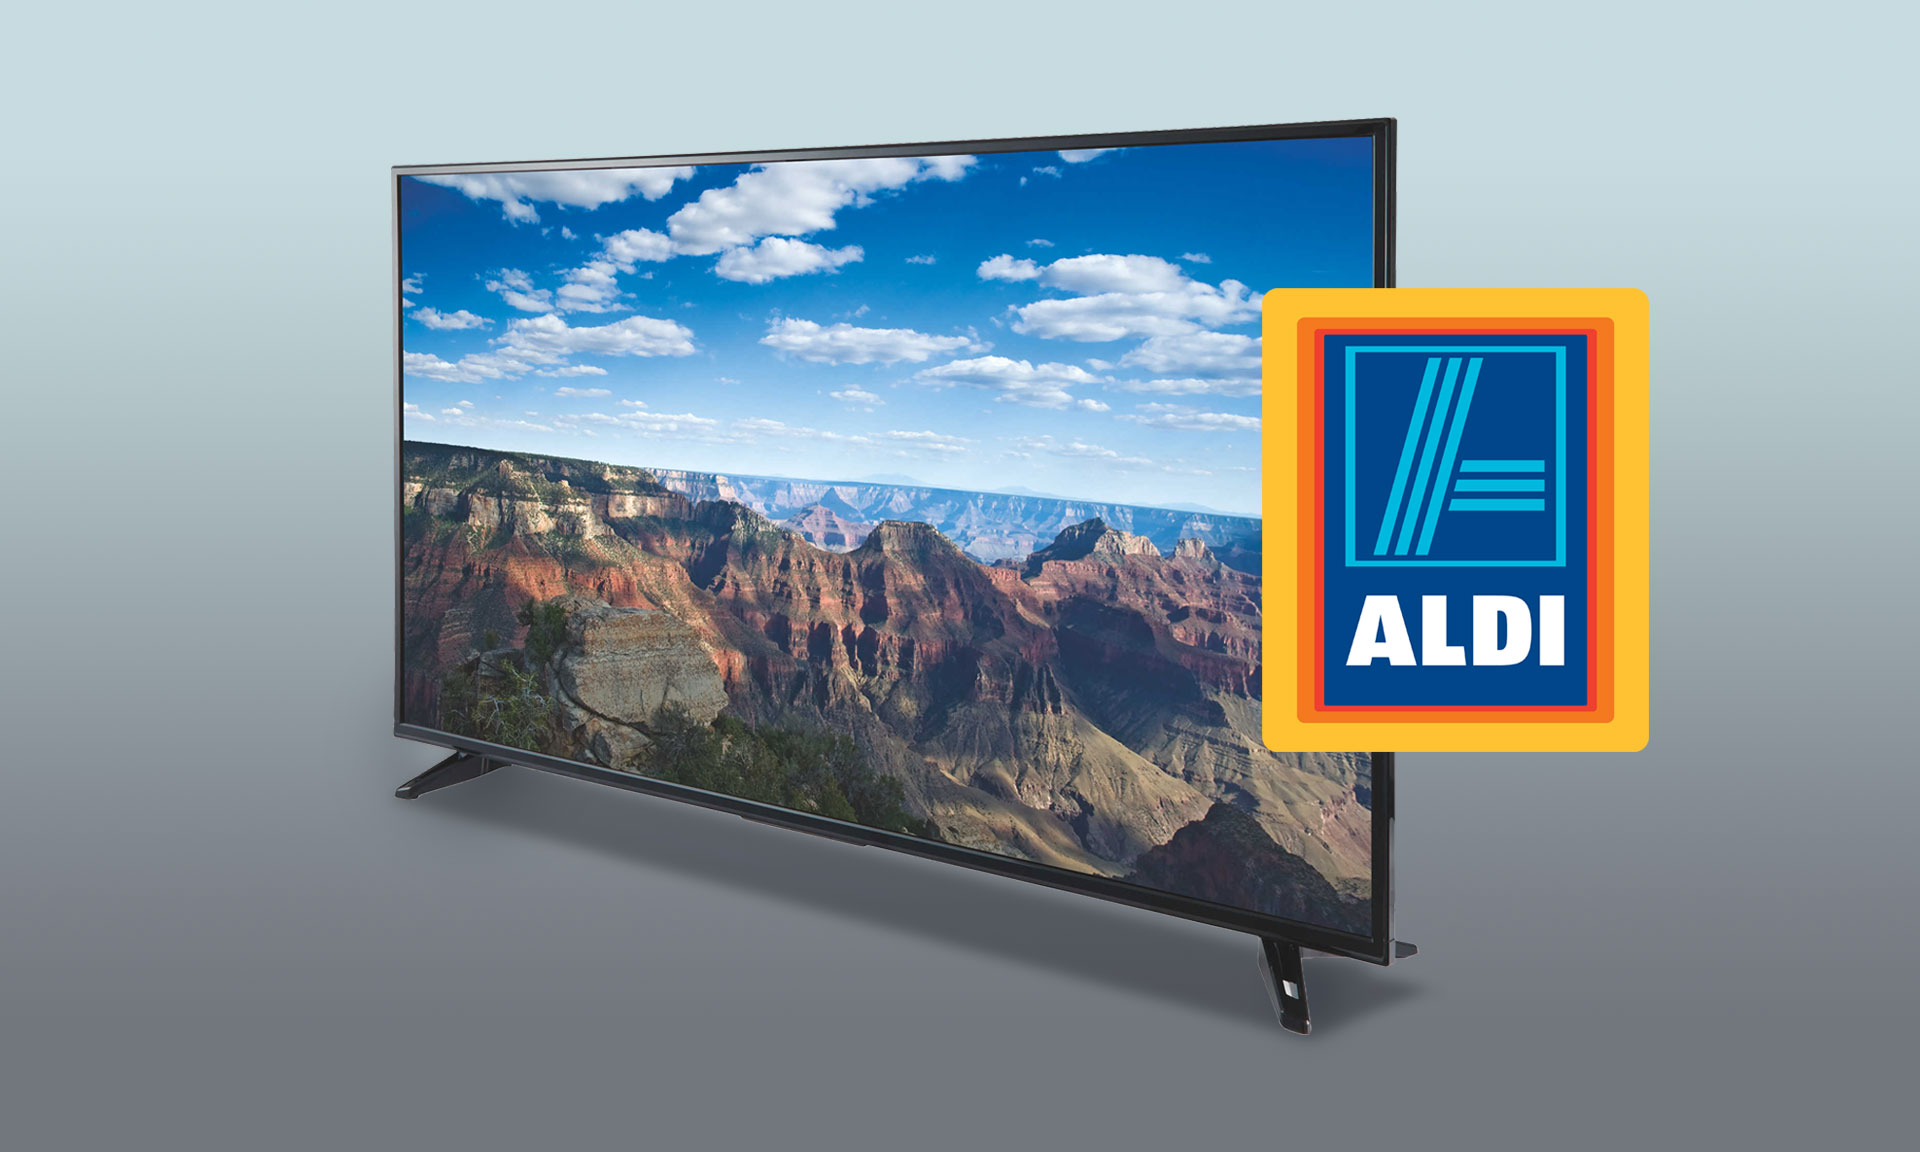 4K Bauhn TV On Sale At Aldi For Just U00a3320 U2013 Which News